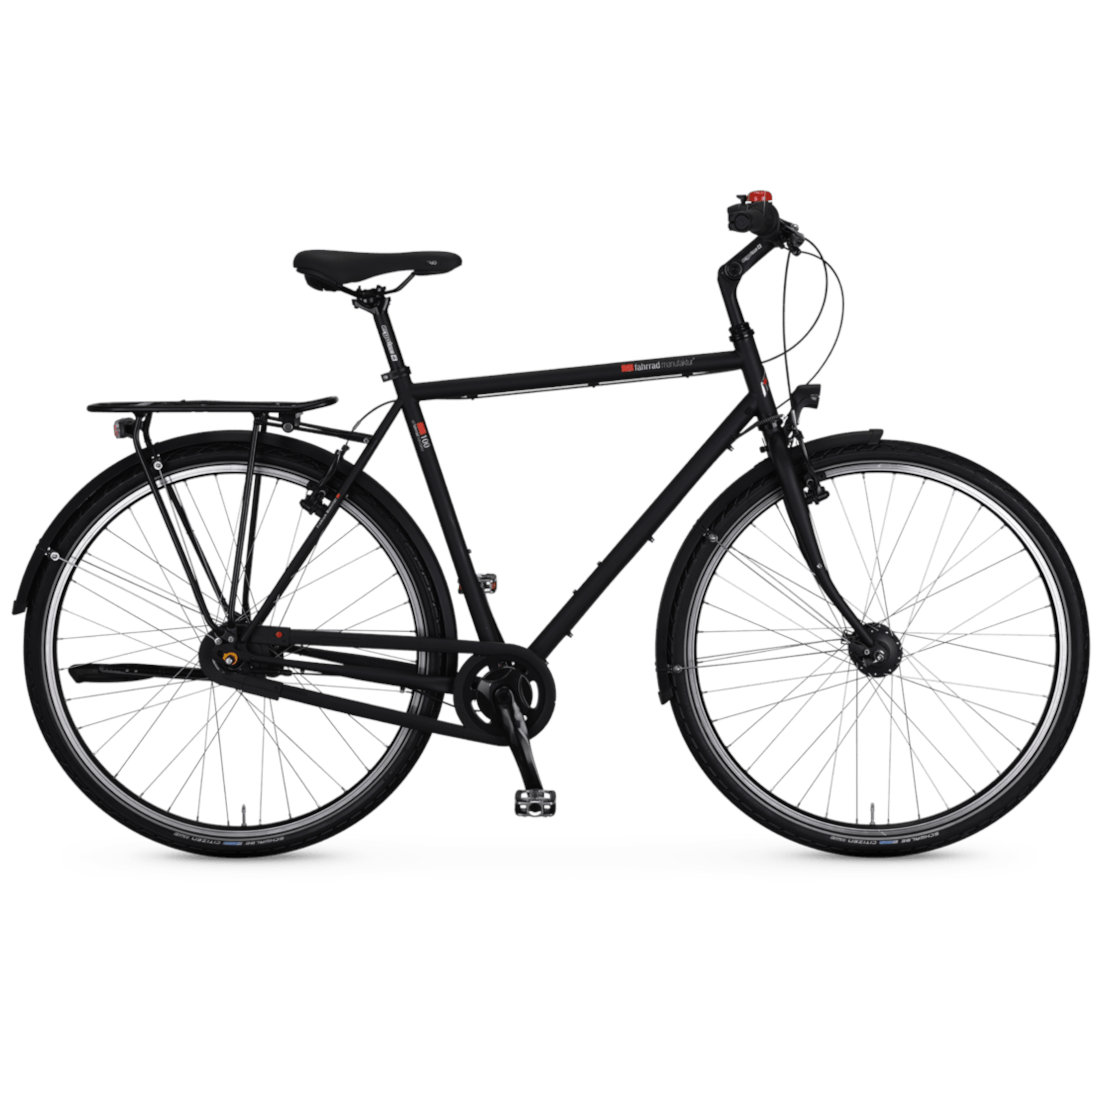 vsf fahrradmanufaktur T-100 HS11 Nexus - Men Trekking Bike - 2022 - ebony matte